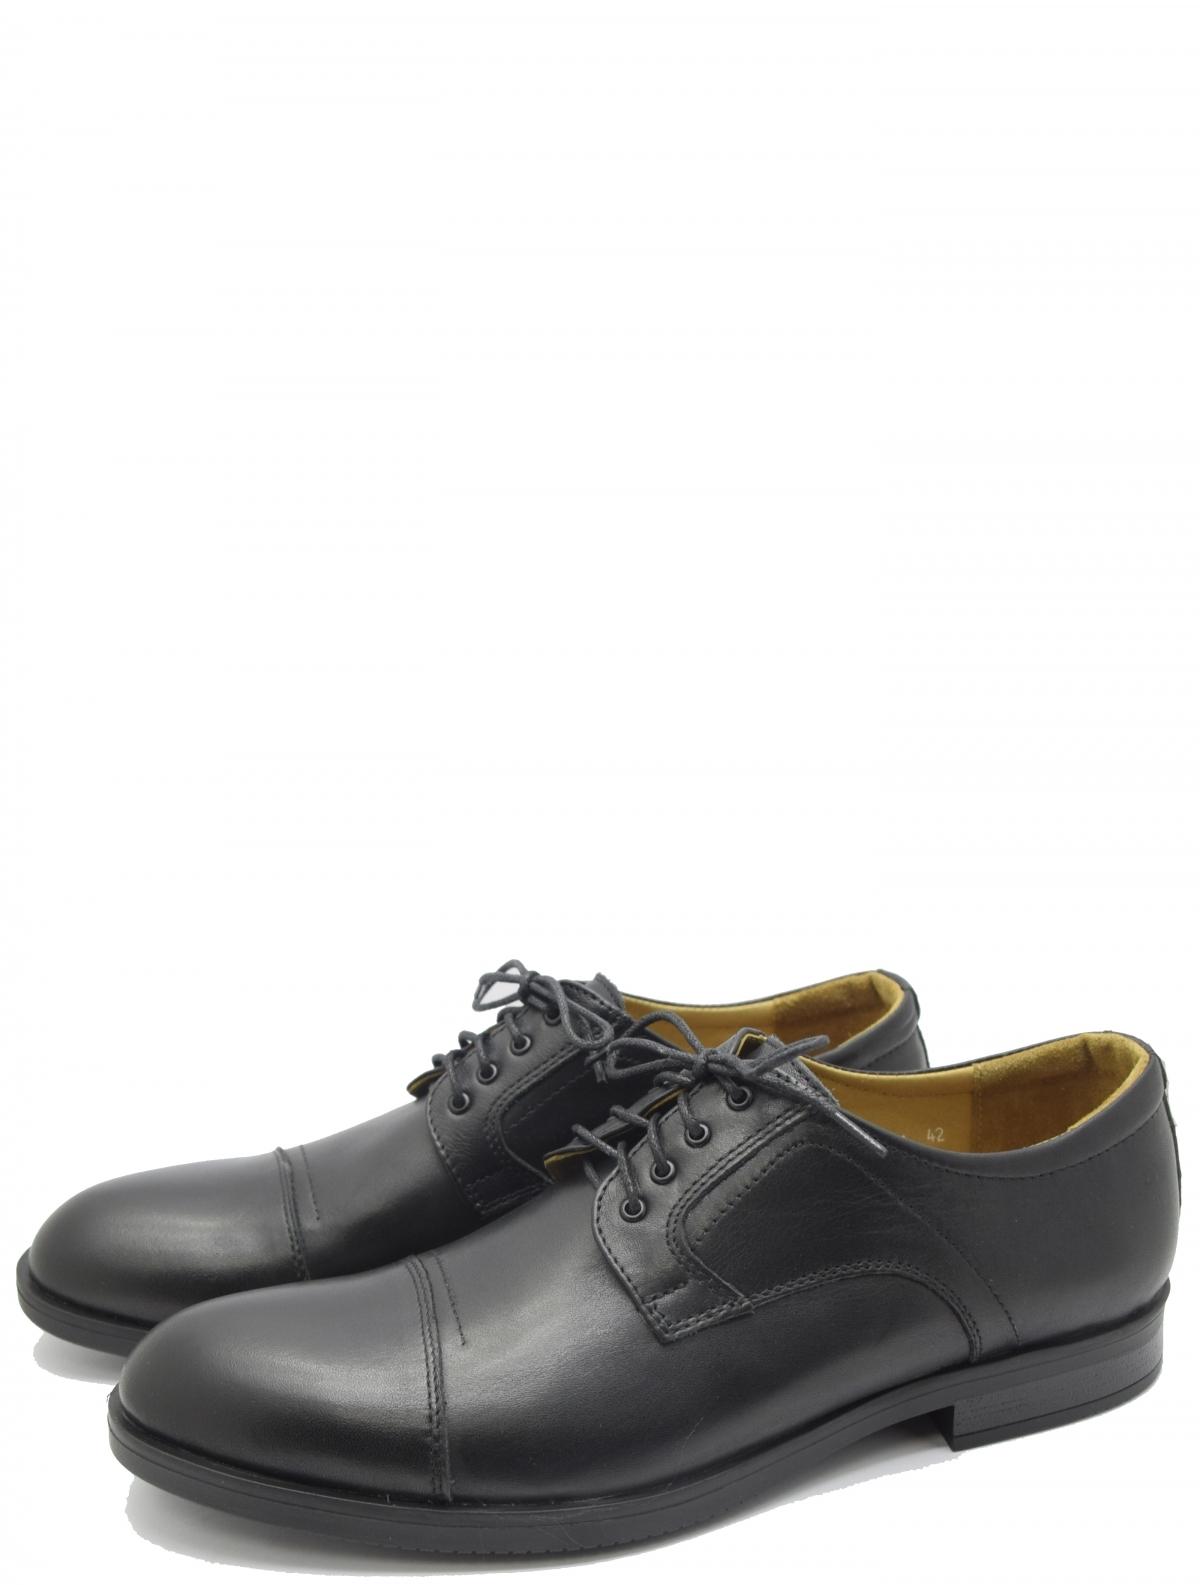 Bossner 1-271-101-1 мужские туфли